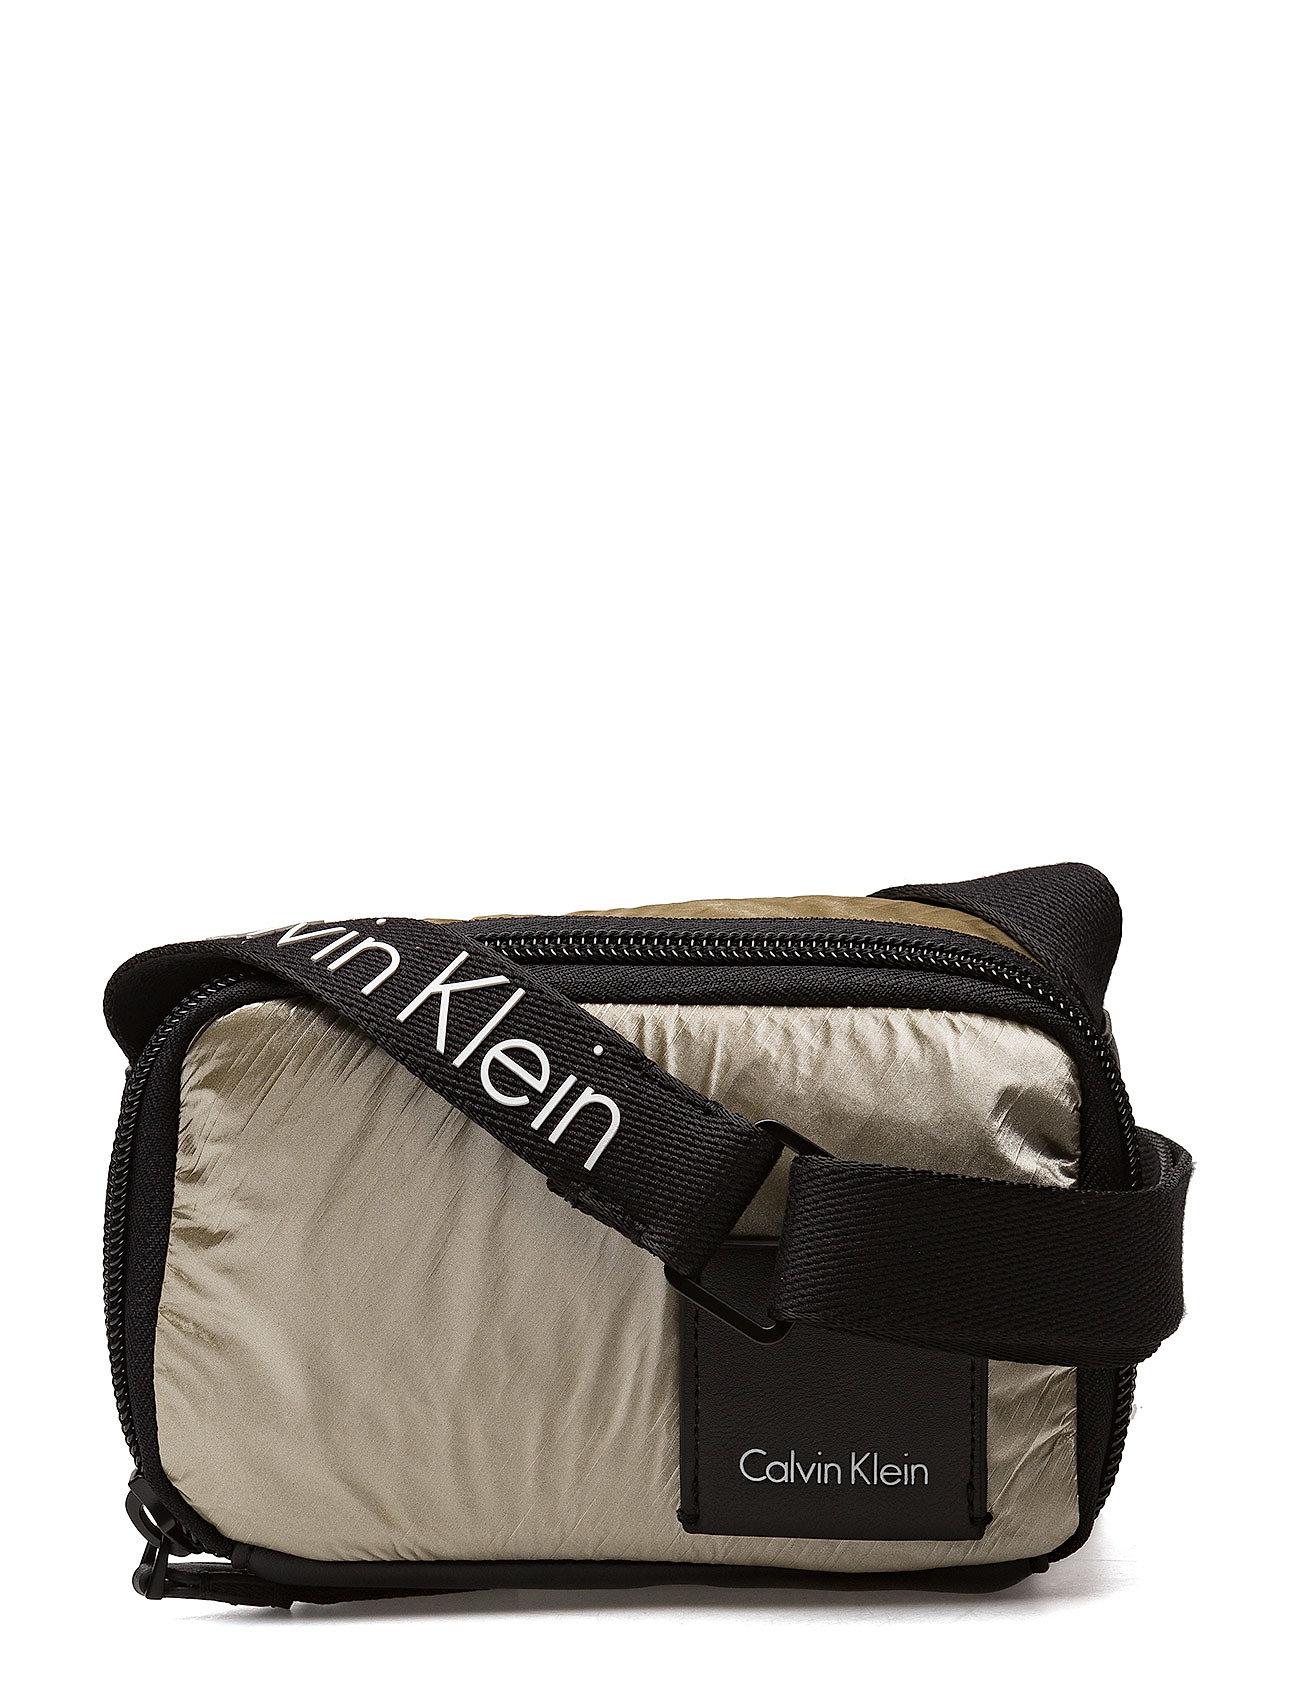 Calvin Klein FLUID SMALL CROSSBOD